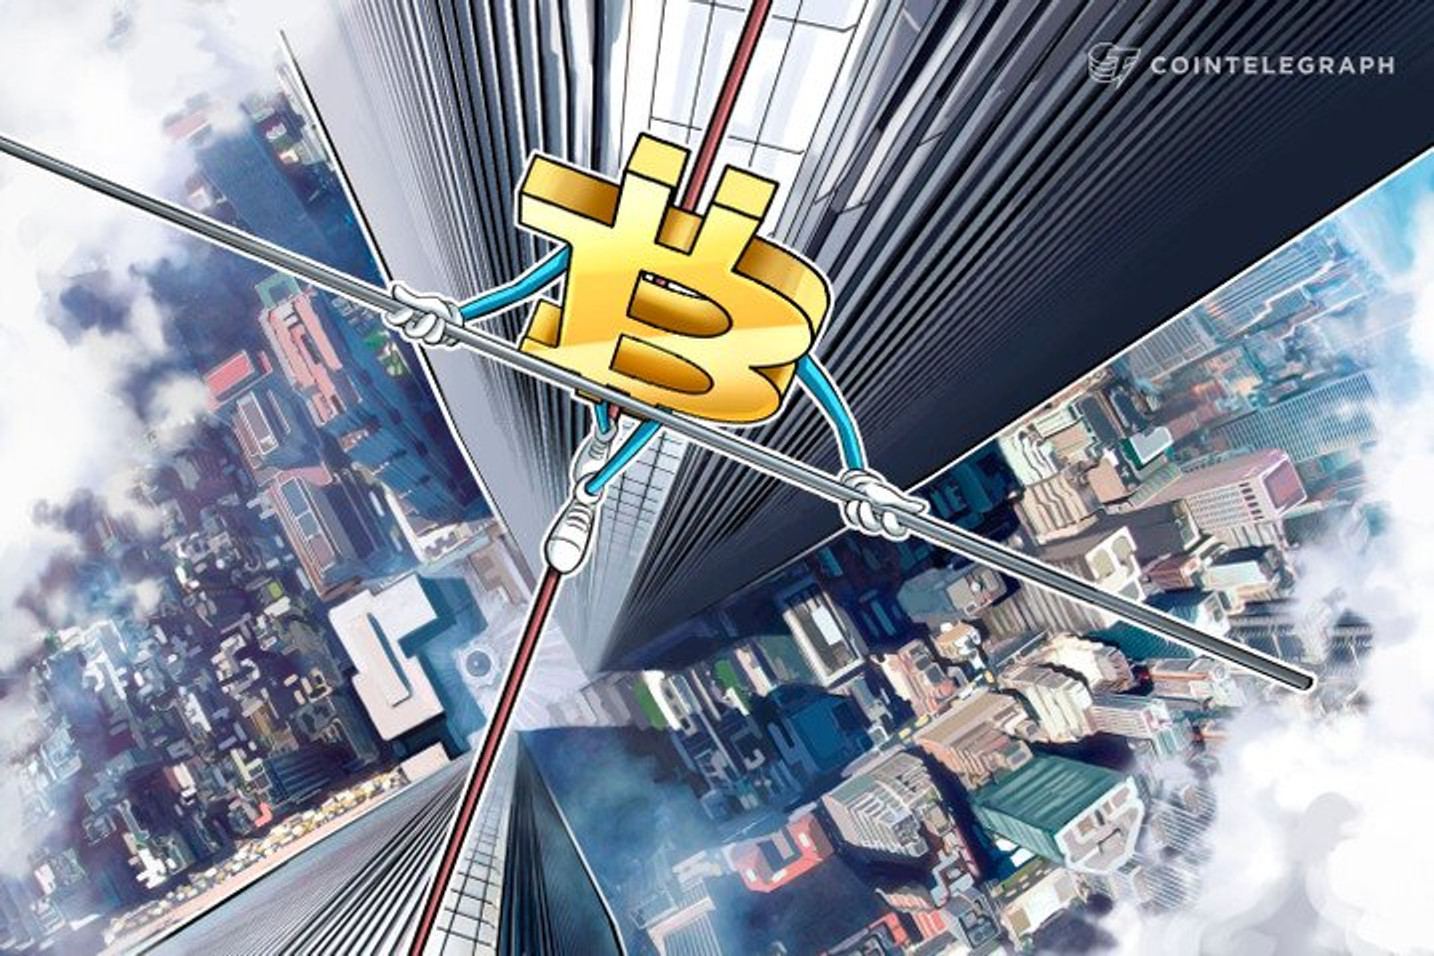 'Se o Bitcoin quebrar, leva todo o mercado com ele', alerta a Forbes Brasil